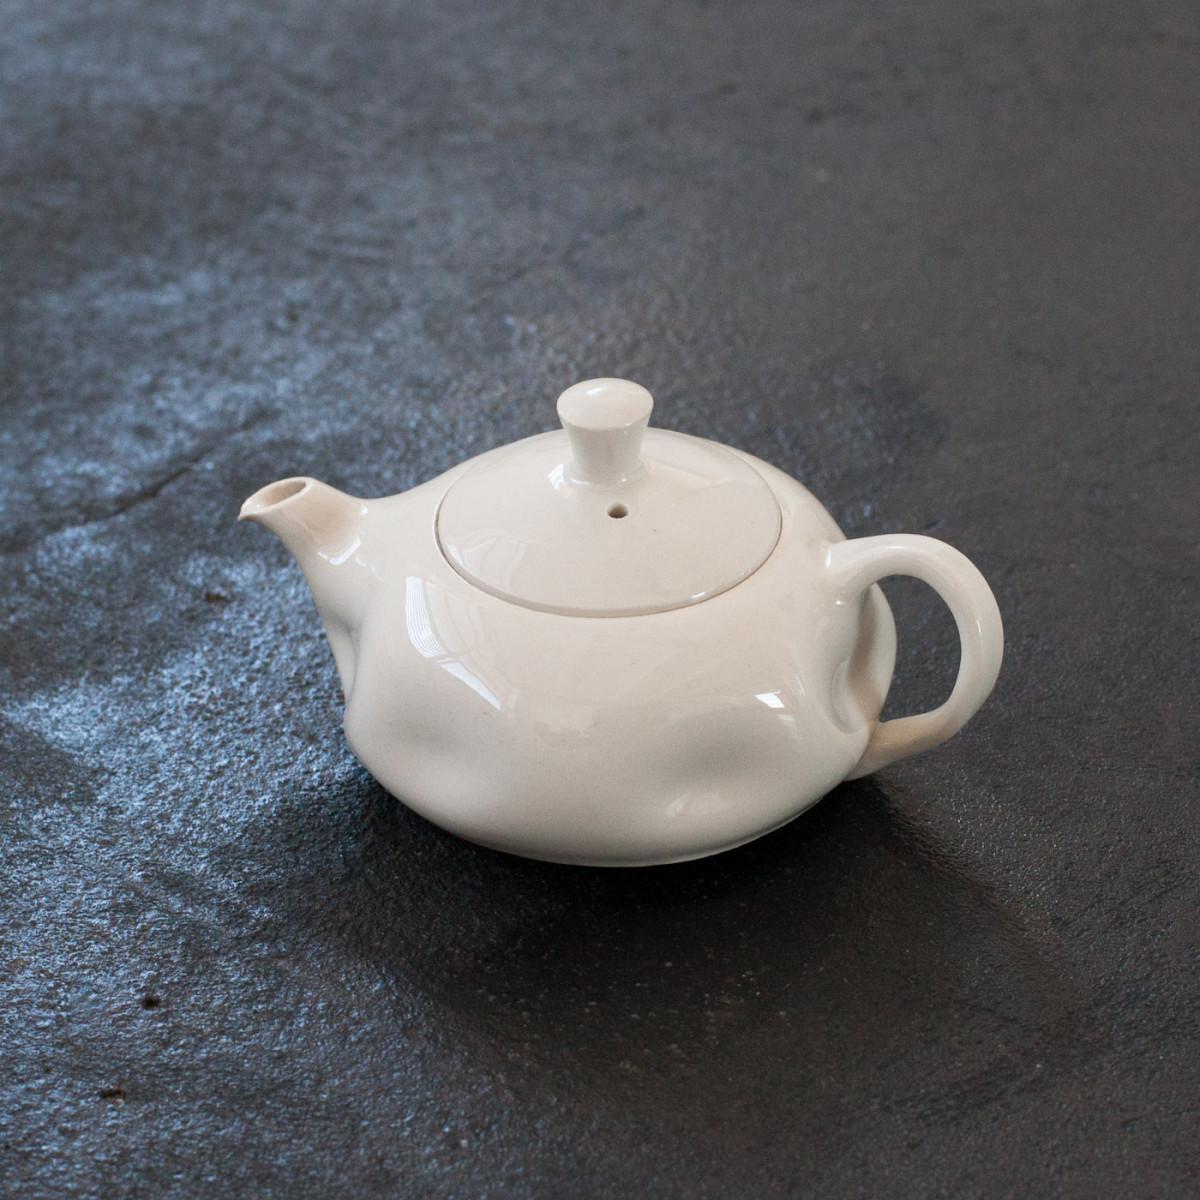 Milan vasek porcelainteapot